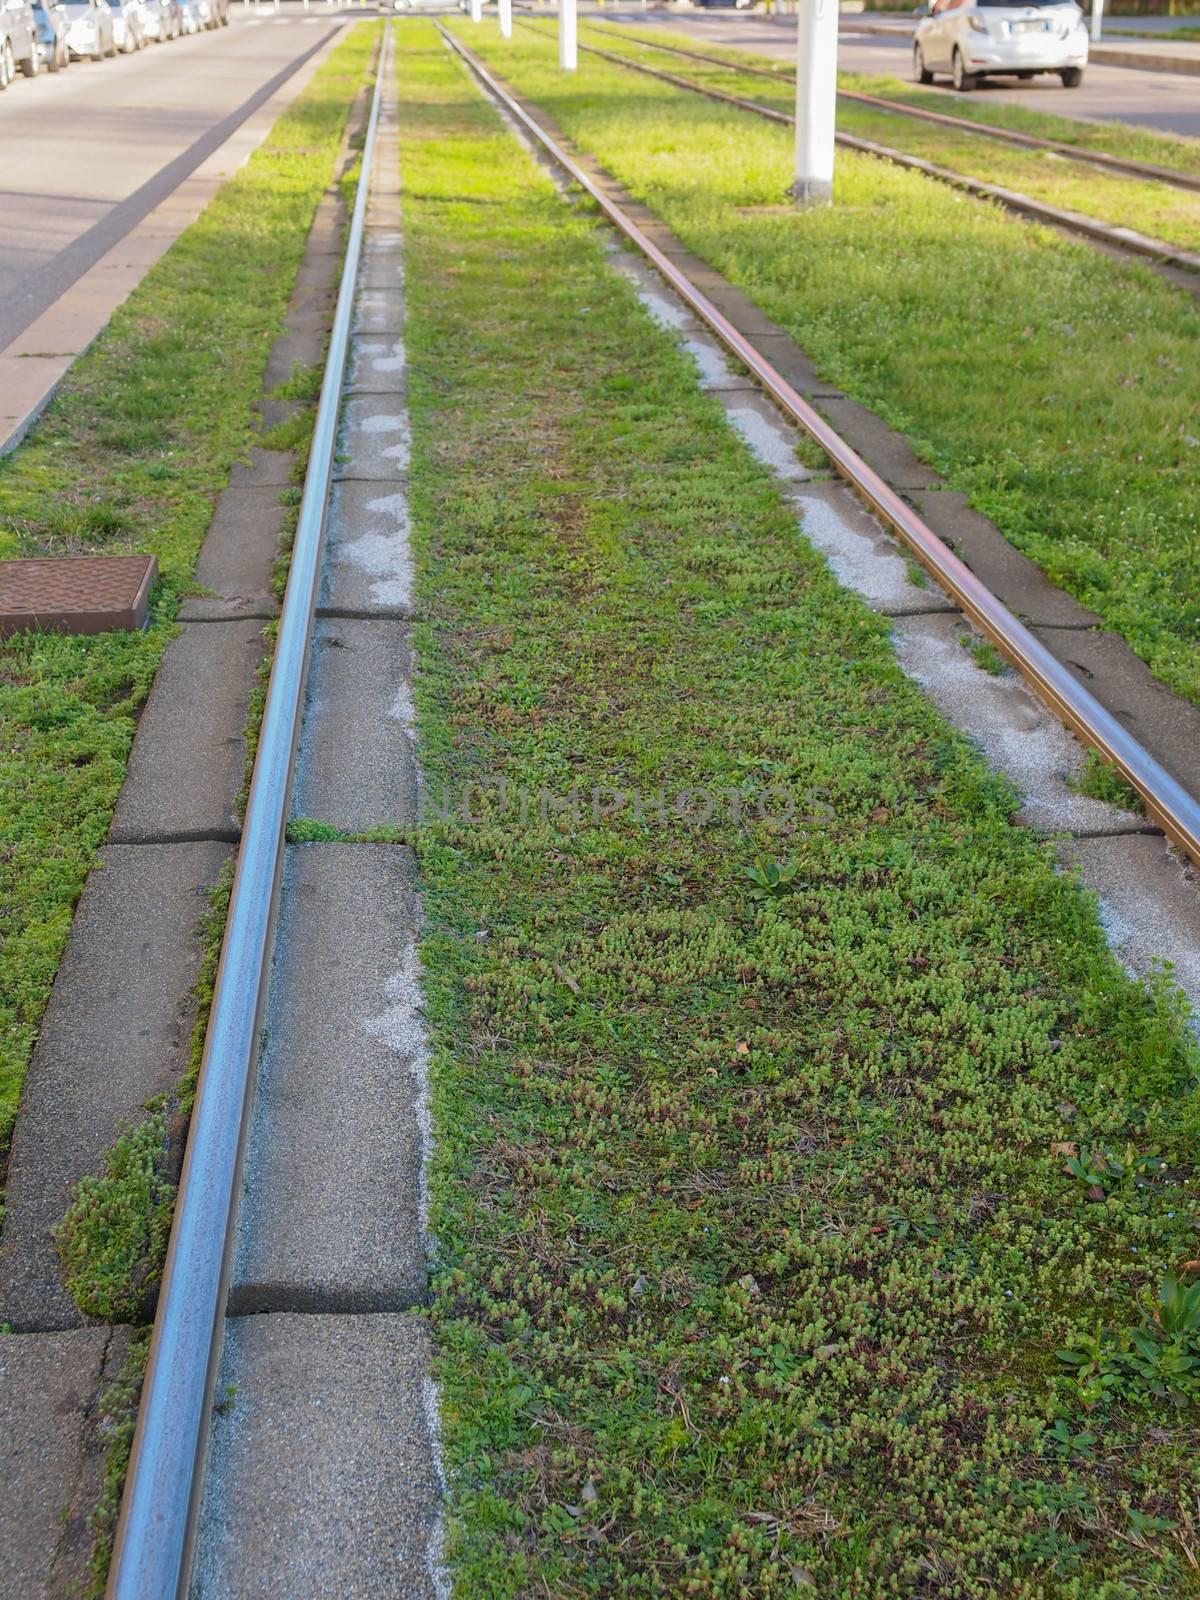 Railway or railroad tracks for train transportation